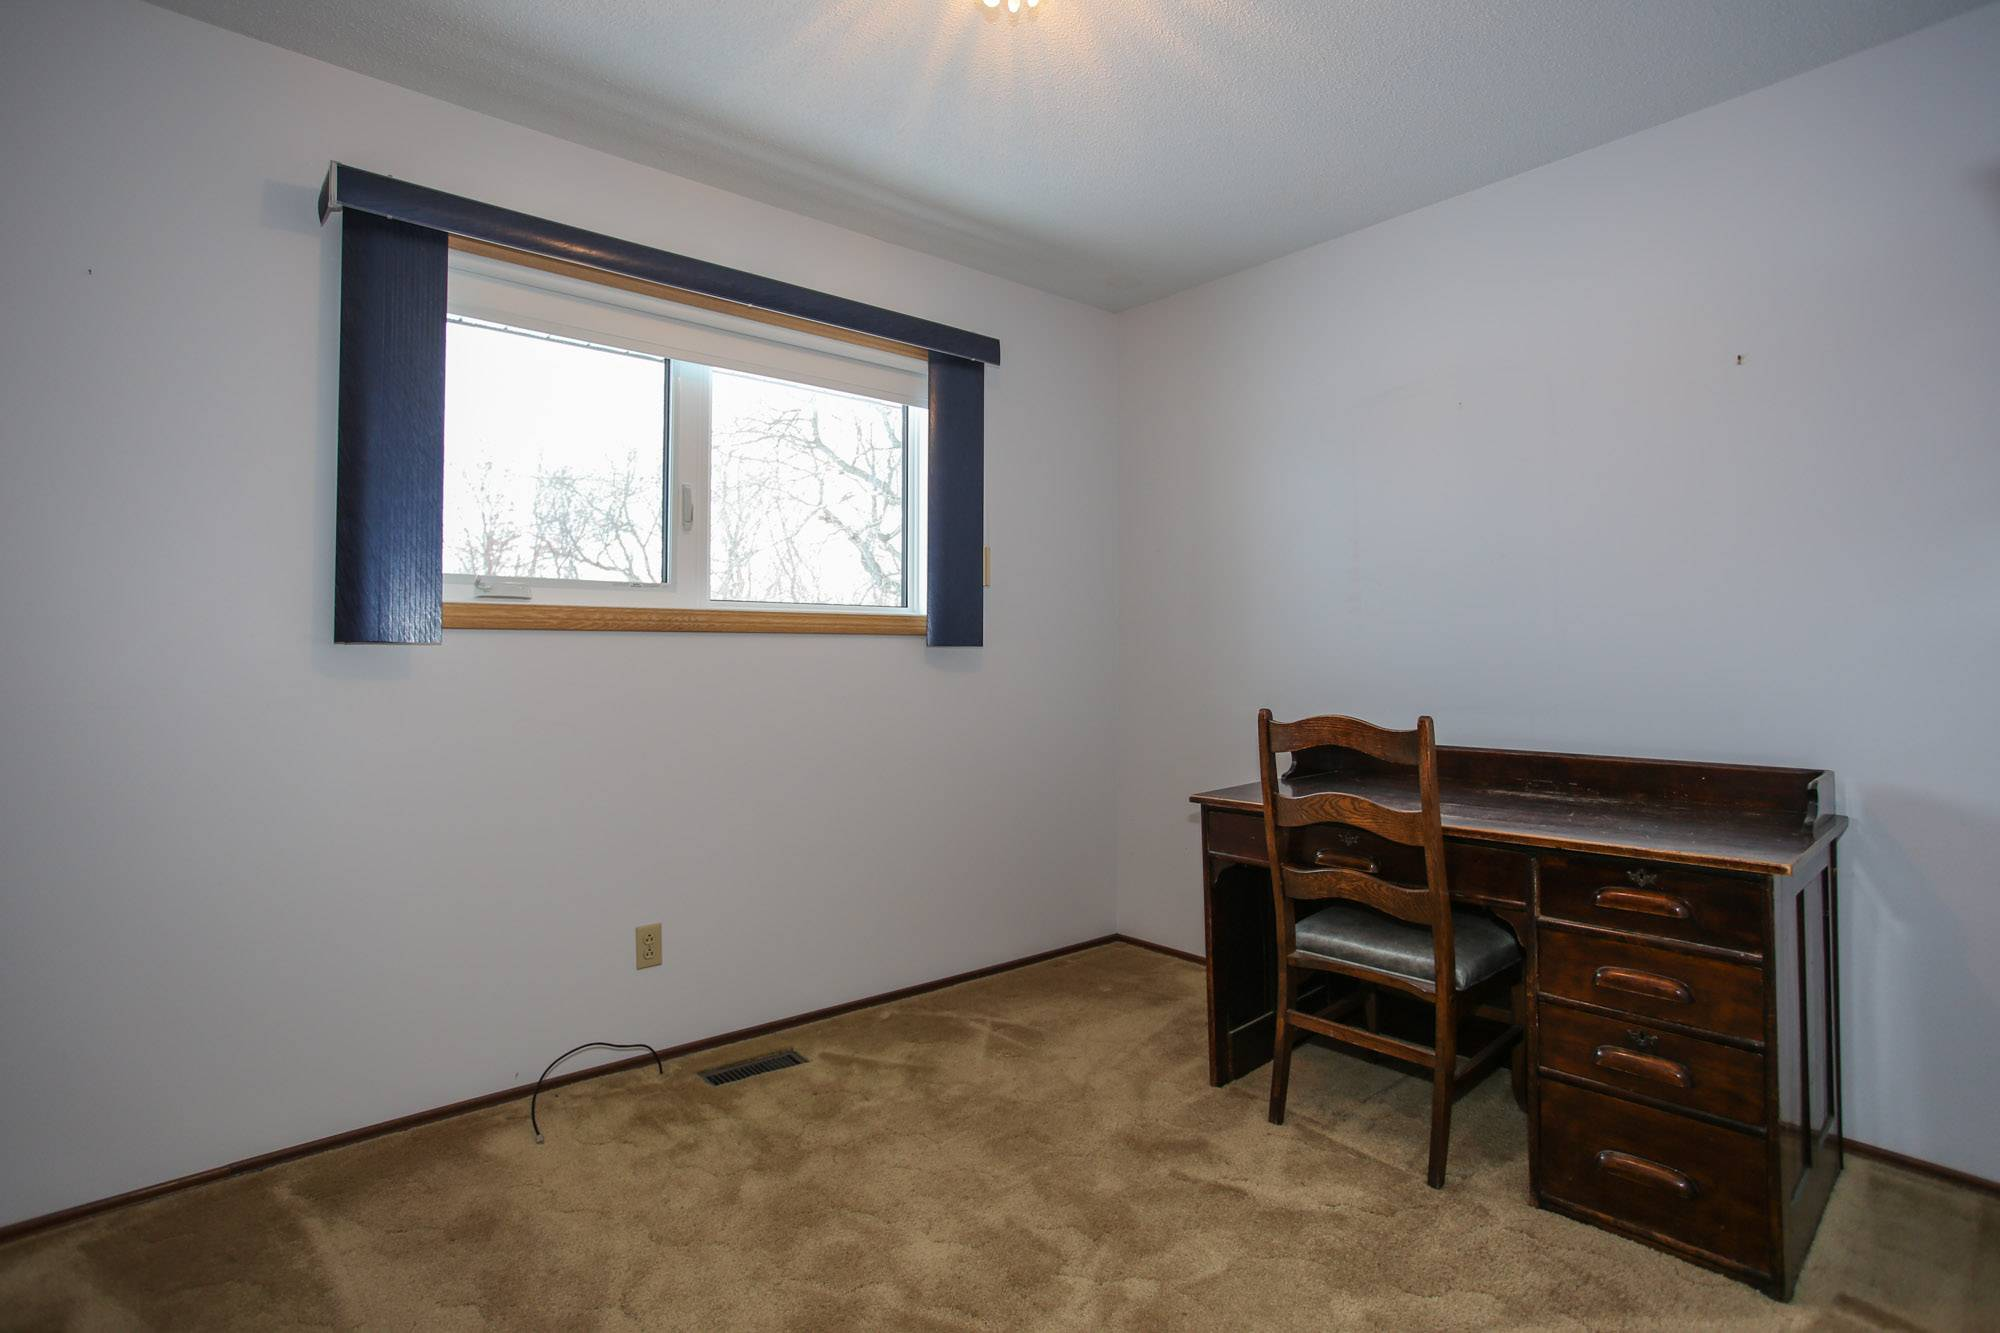 5117-Pr248, Winnipeg, Manitoba  R0G 0P0 - Photo 16 - 1900686